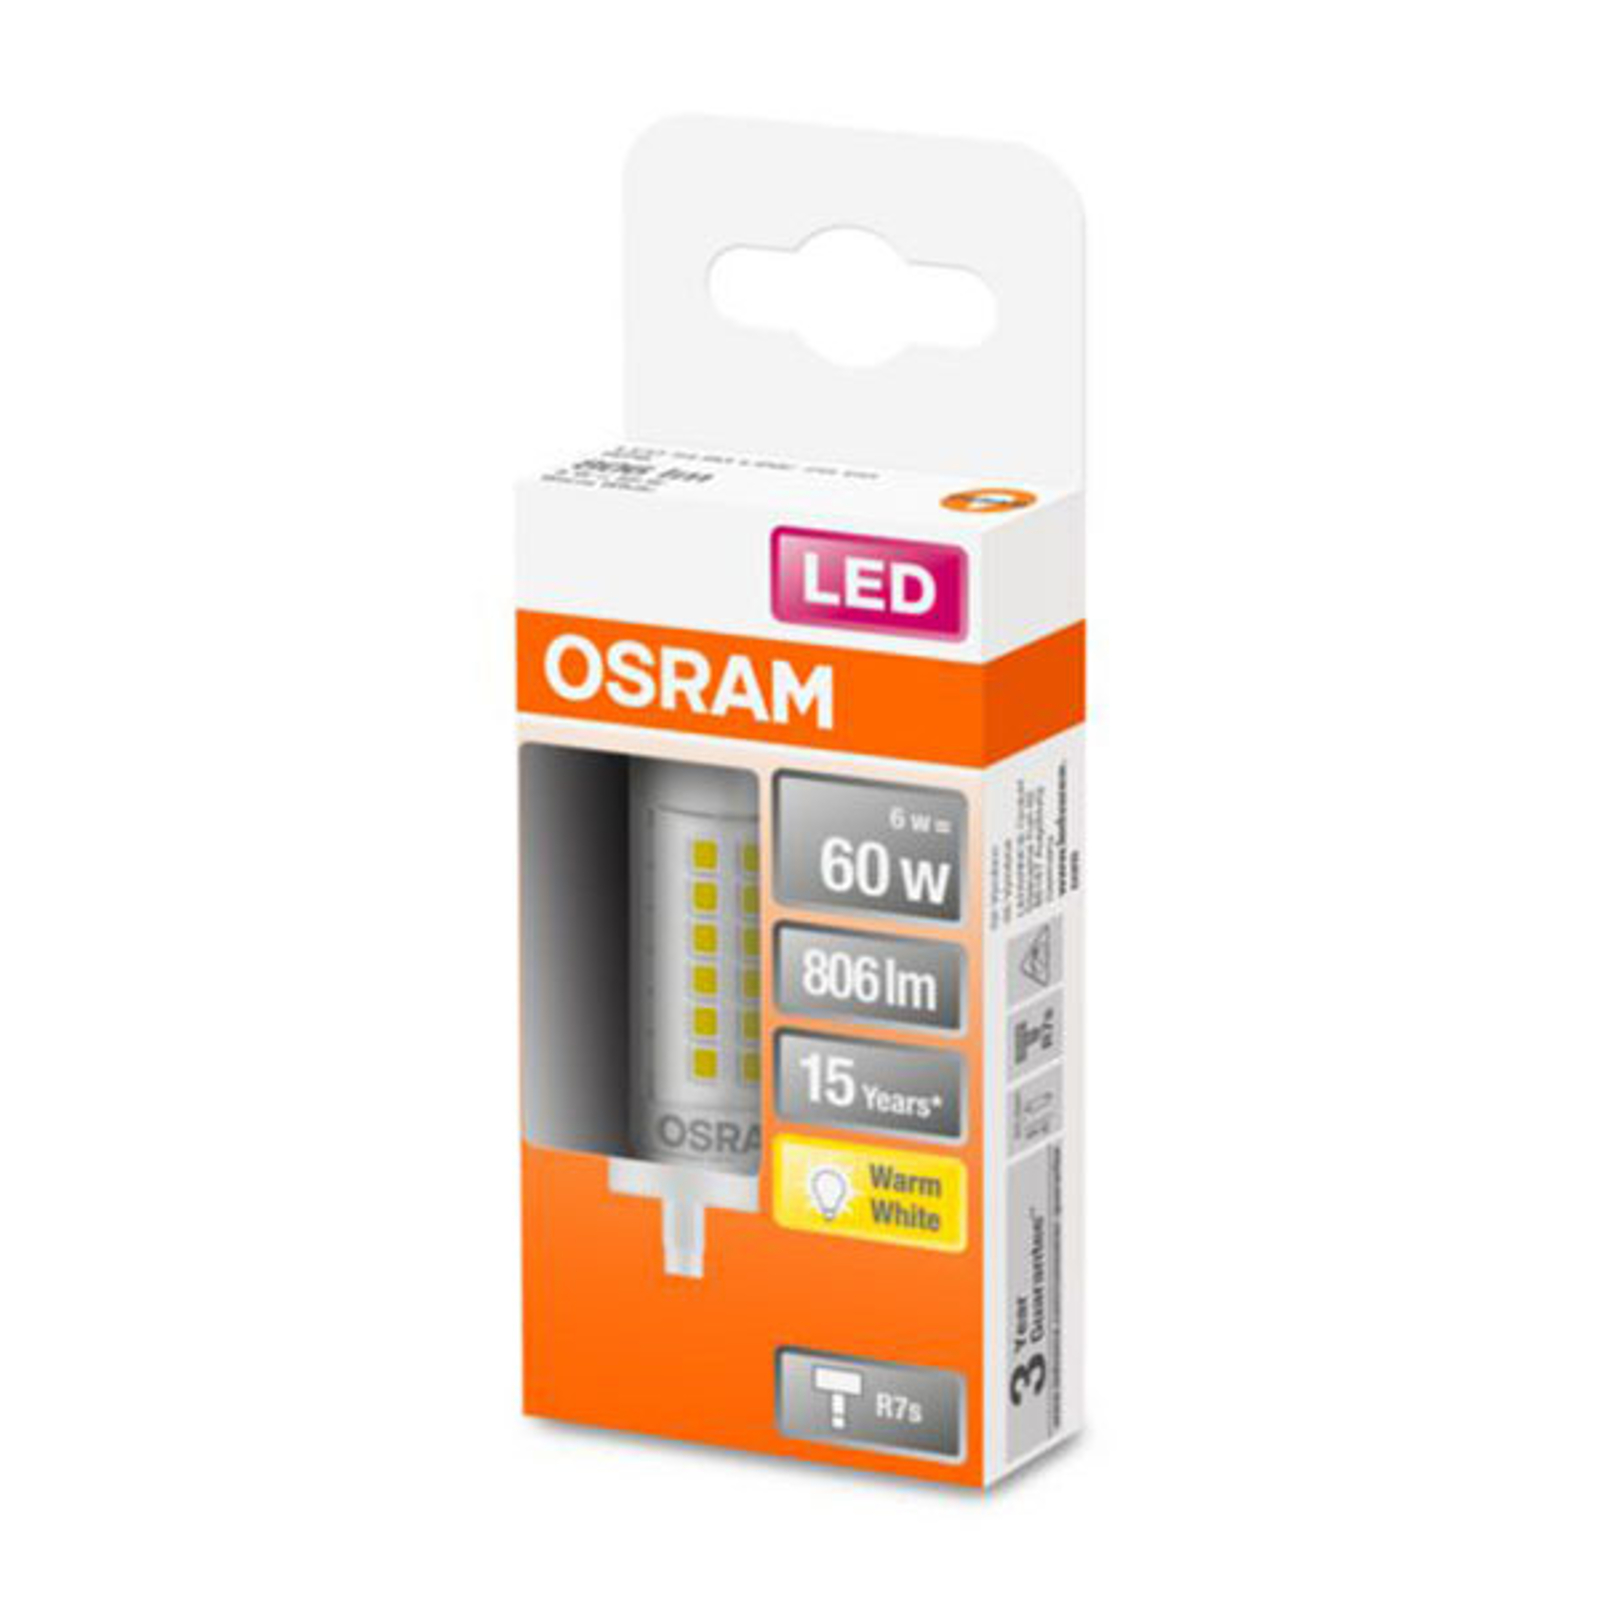 OSRAM-LED-lamppu R7s 6W 2 700 K